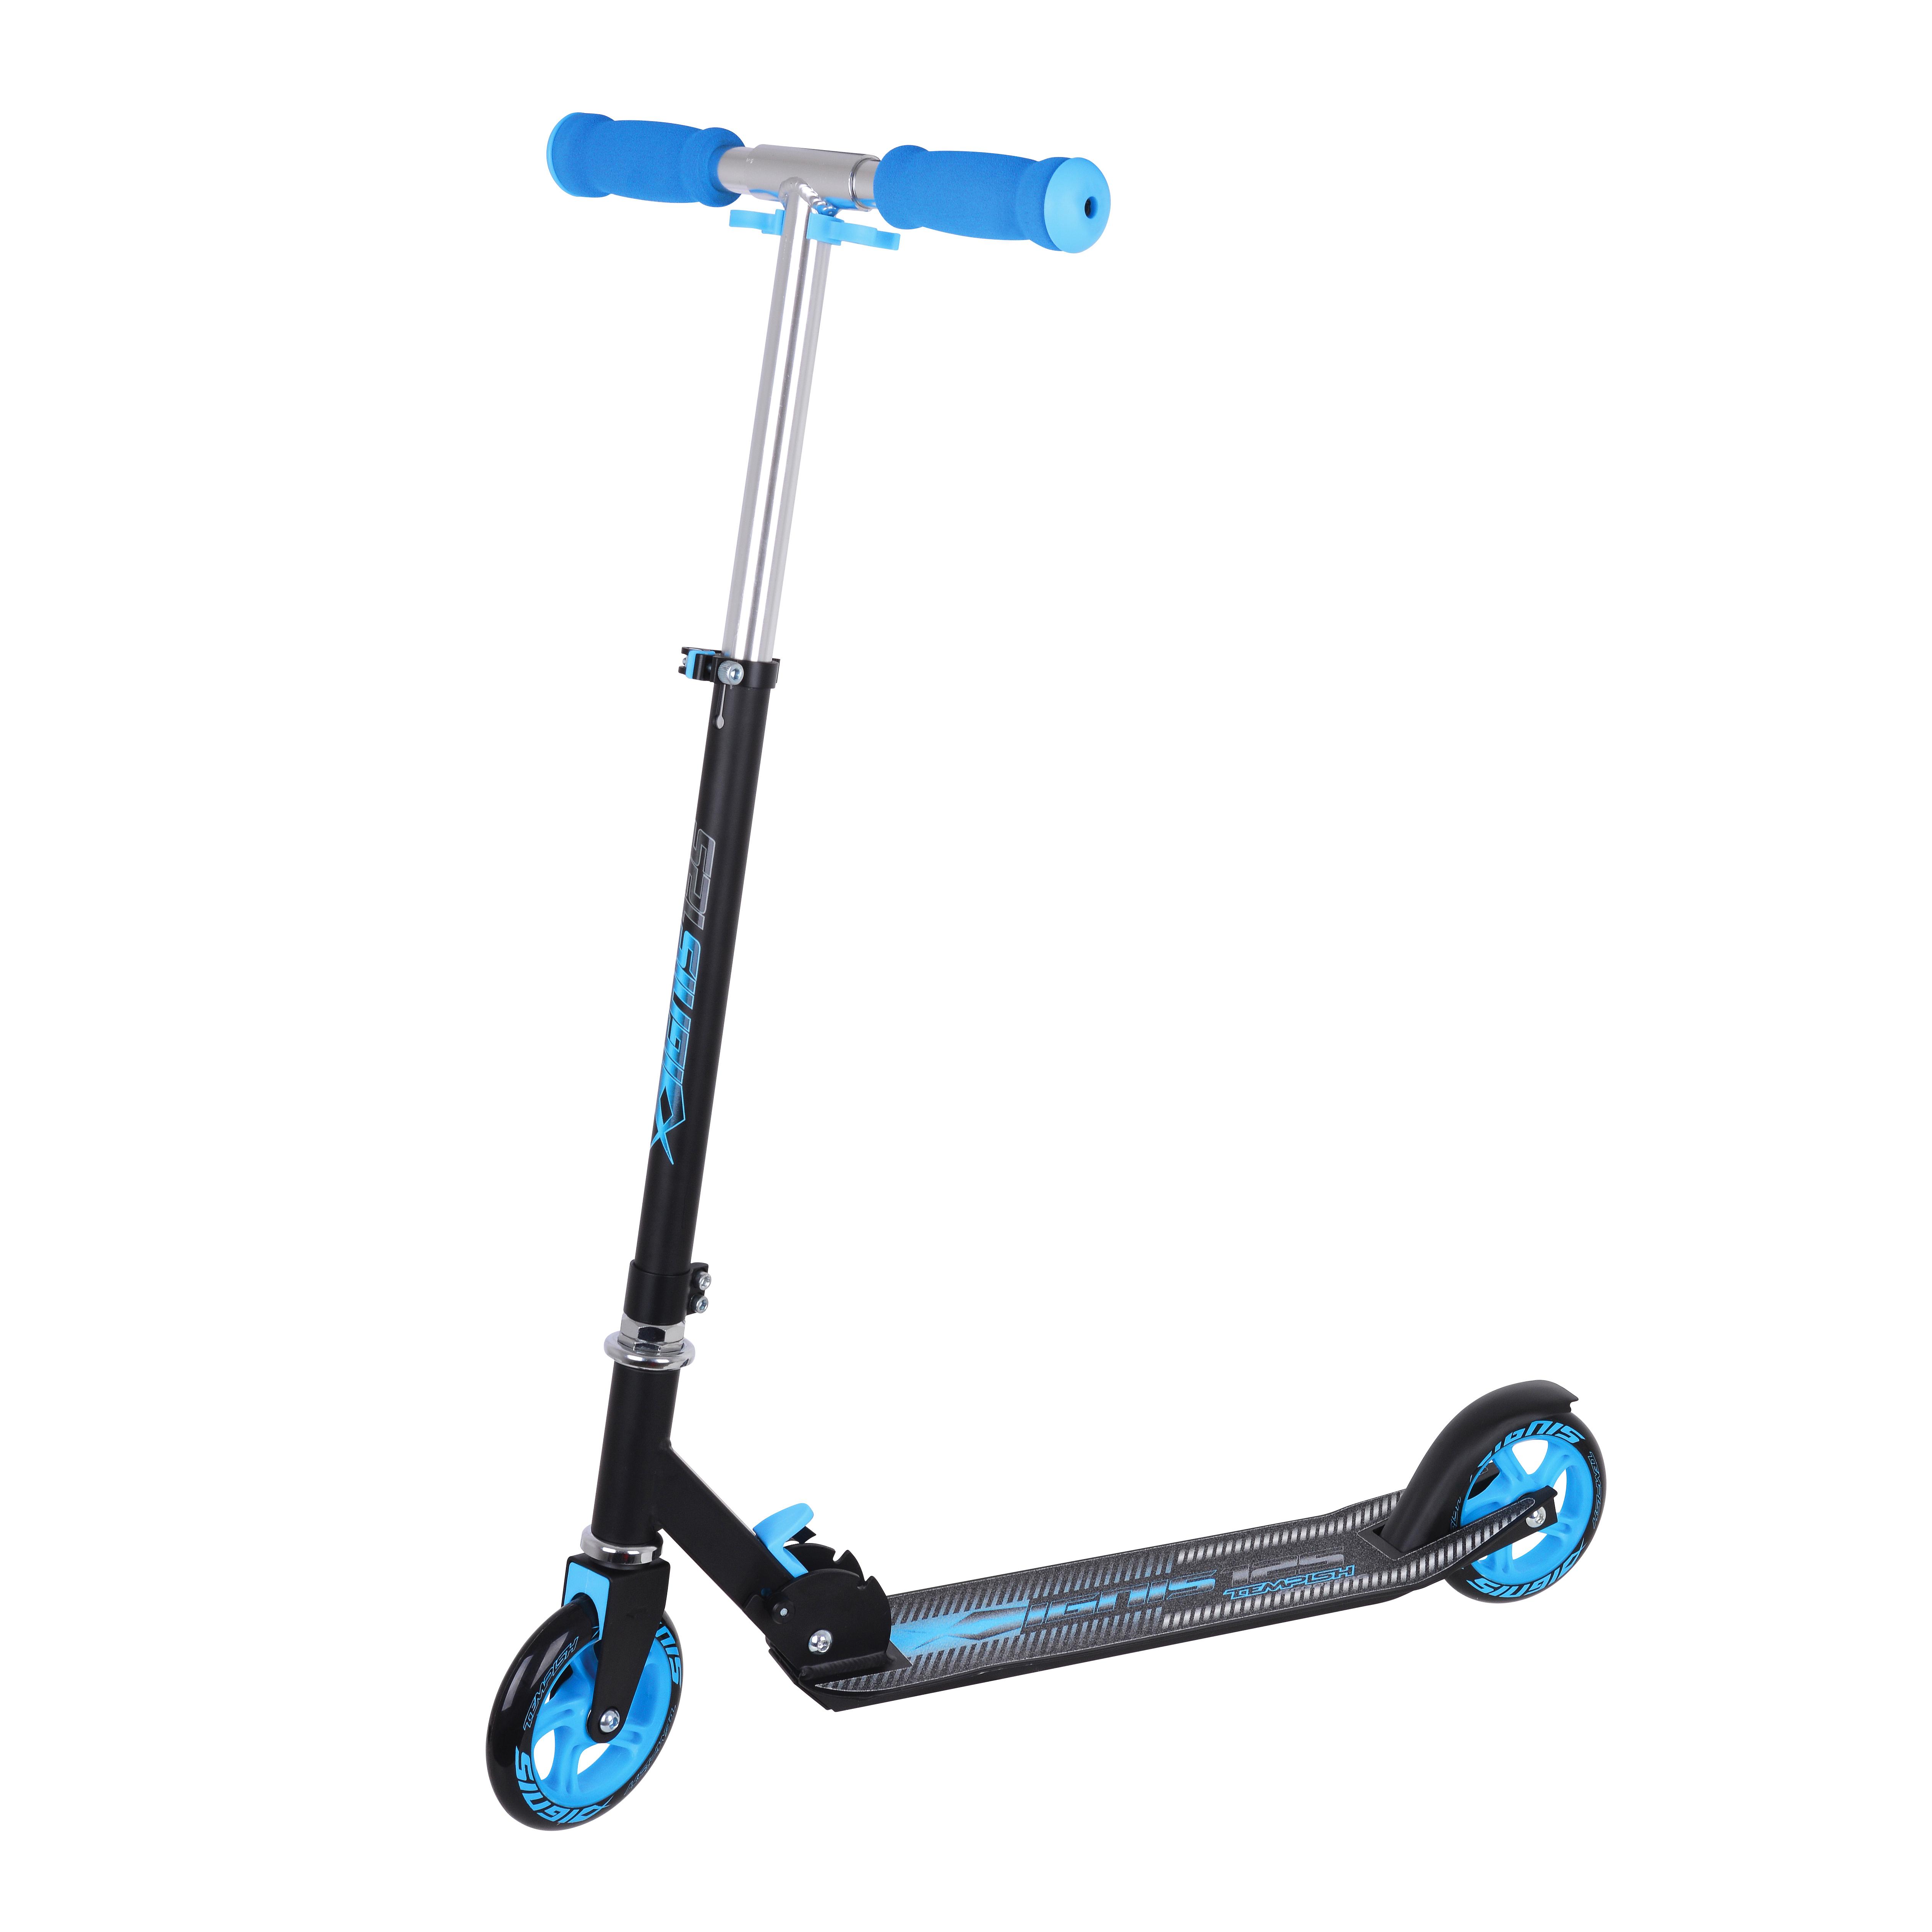 Самокат TEMPISH 2017 IGNIS 125 blue, Самокаты - арт. 819110433